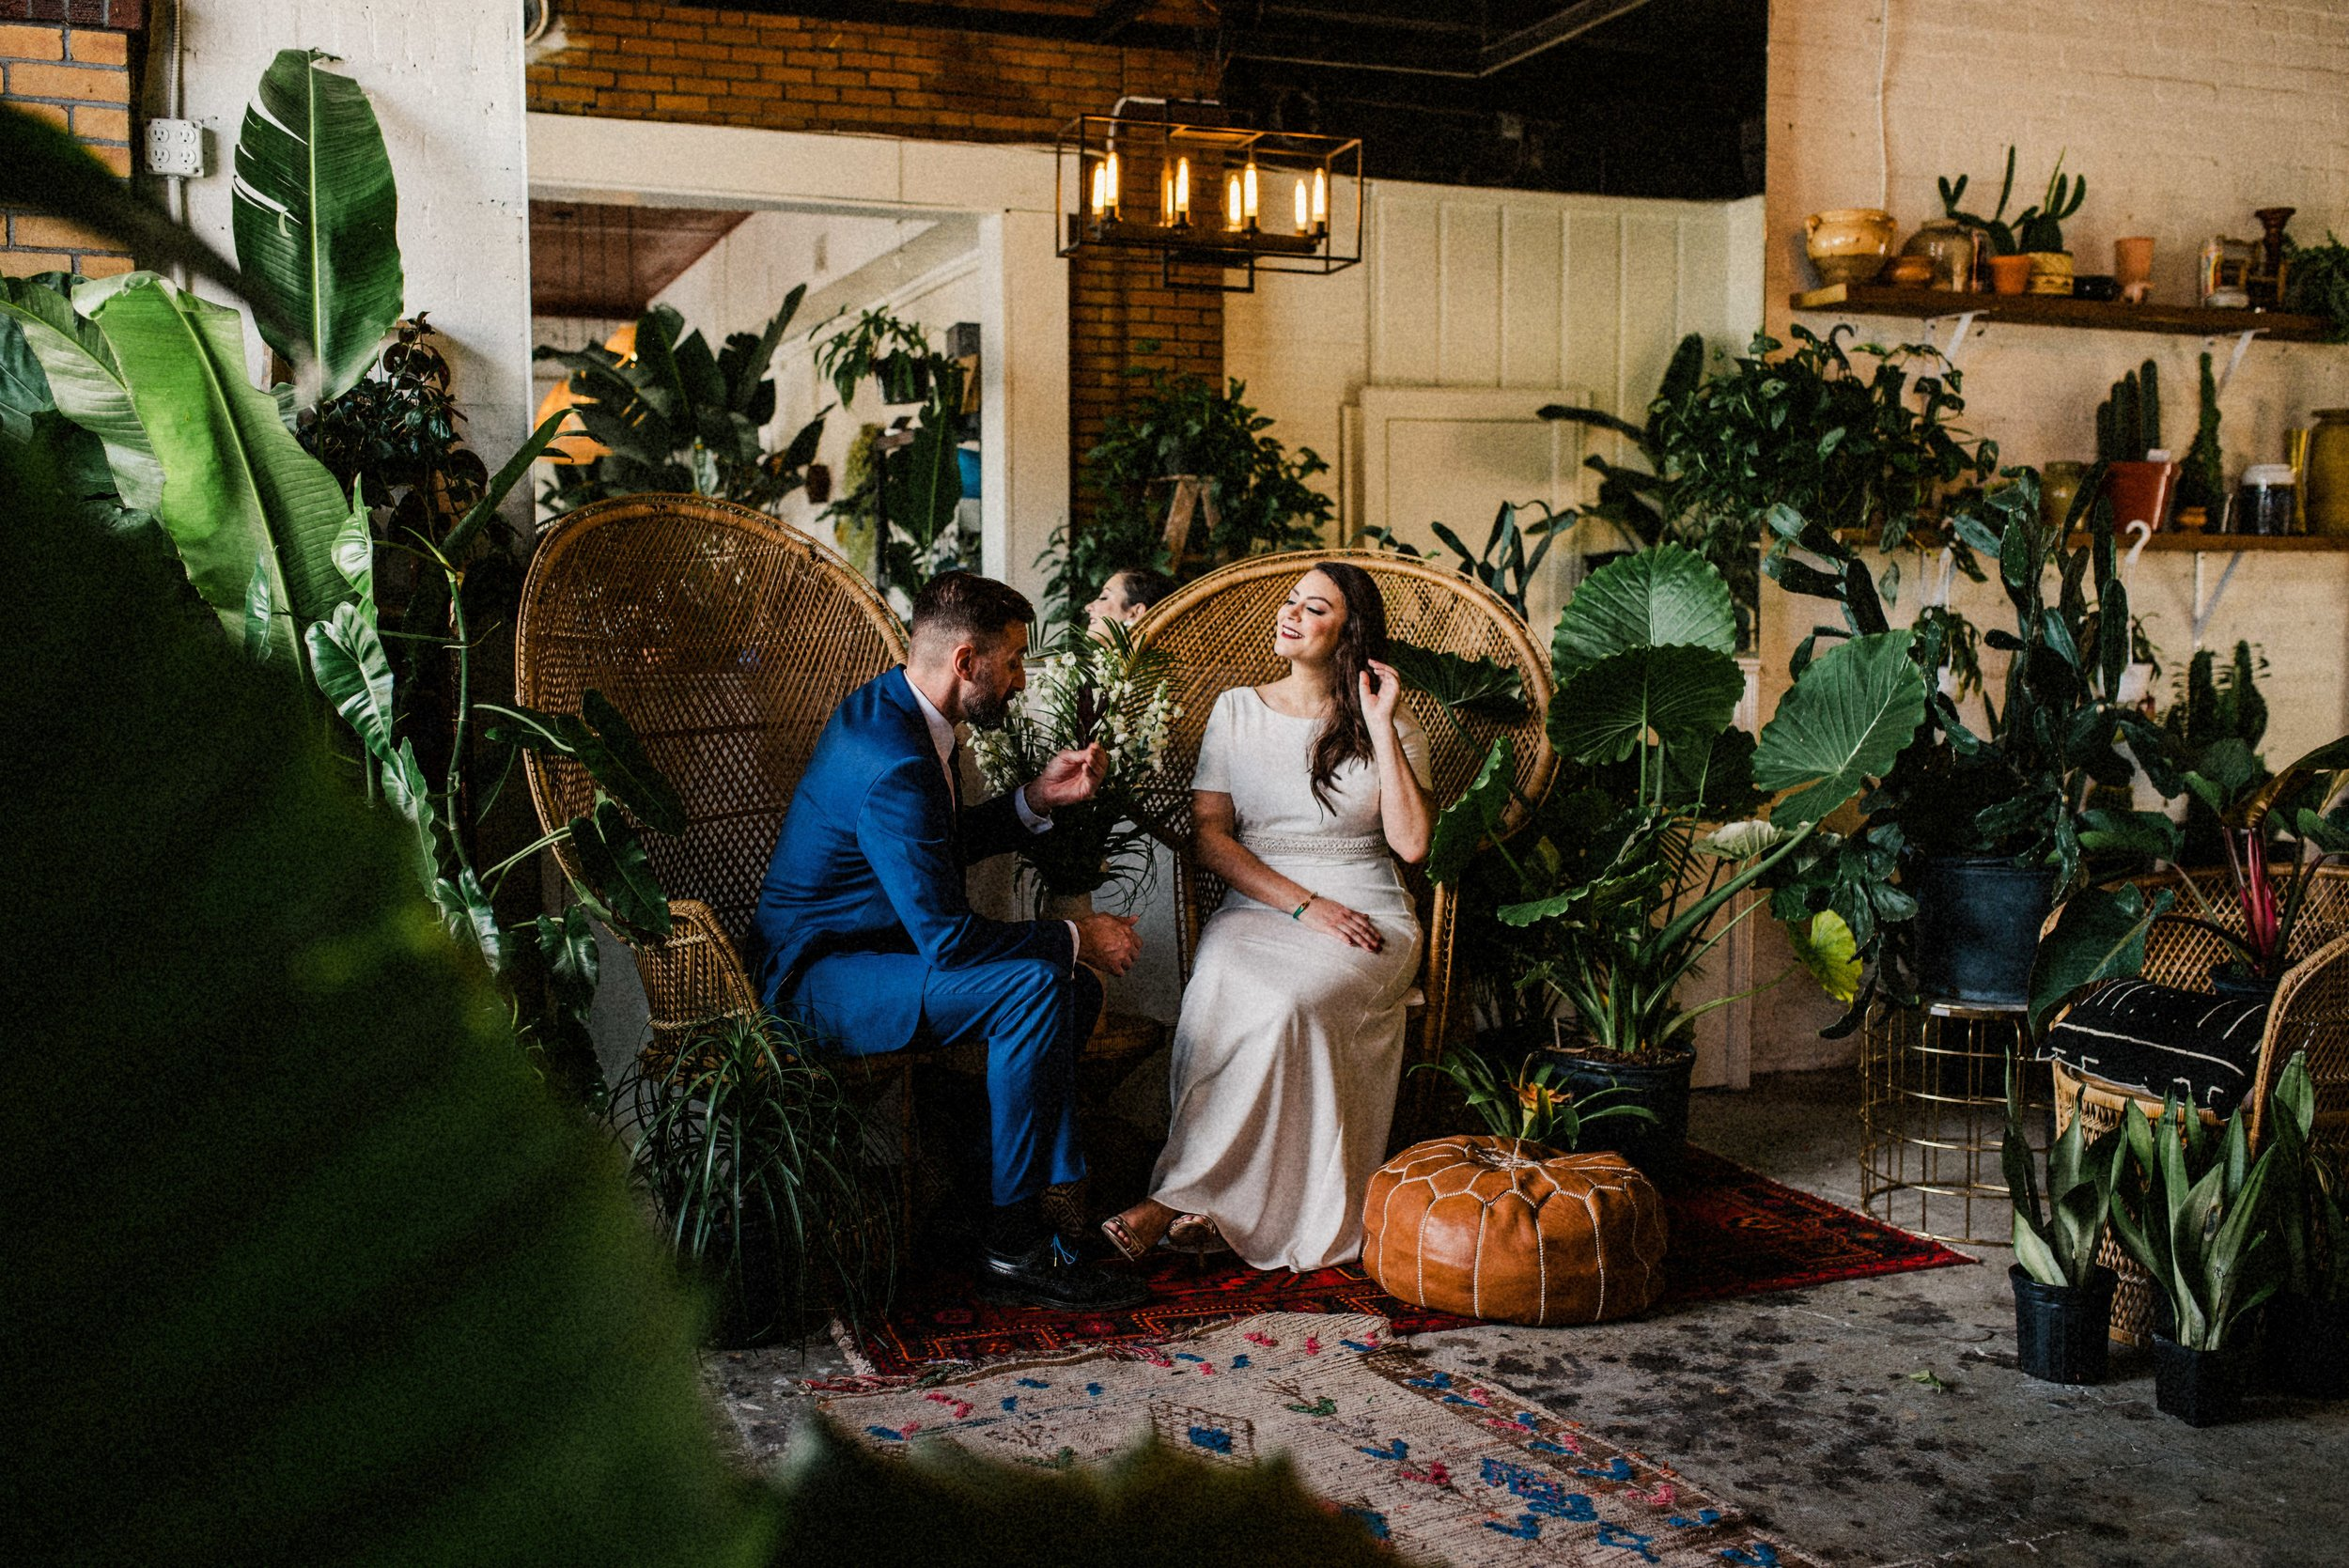 Denee-Leo-Tampa-Florida-Wedding-Rialto-Theatre-244.jpg